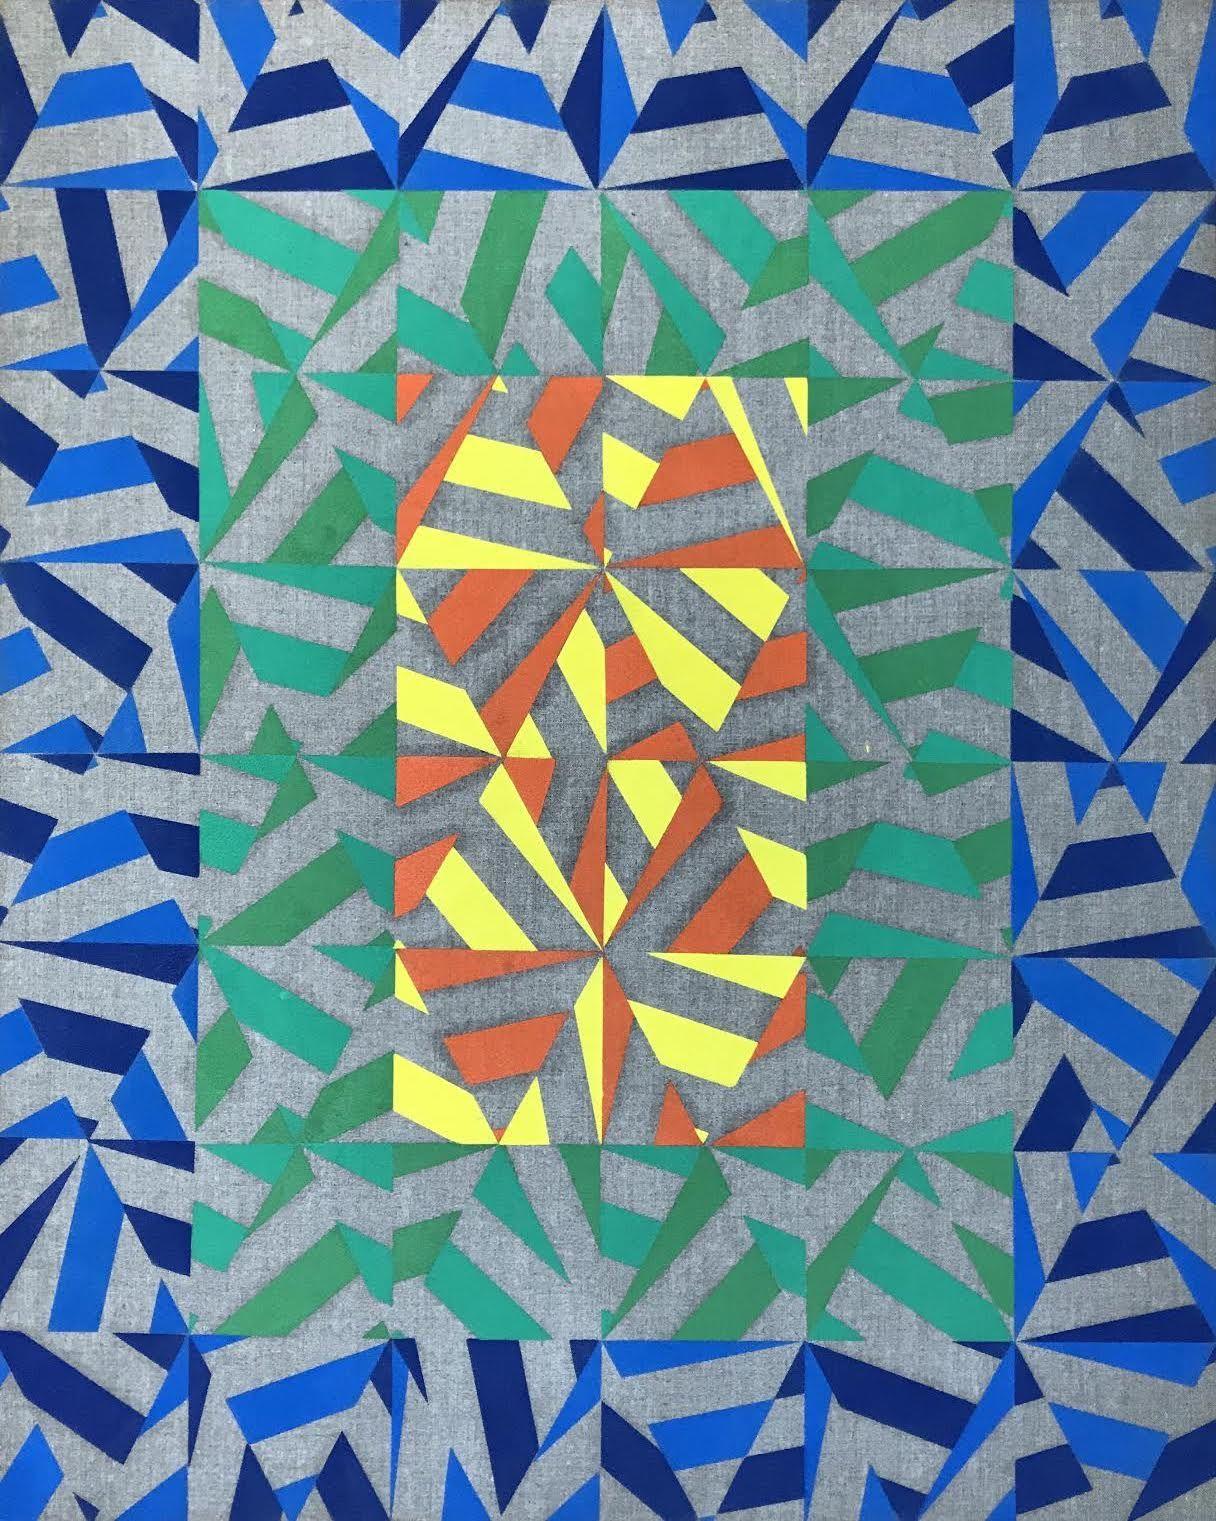 Donald Smith (b.1961) Colour Space, 2019 oil on linen 75 x 65 cm